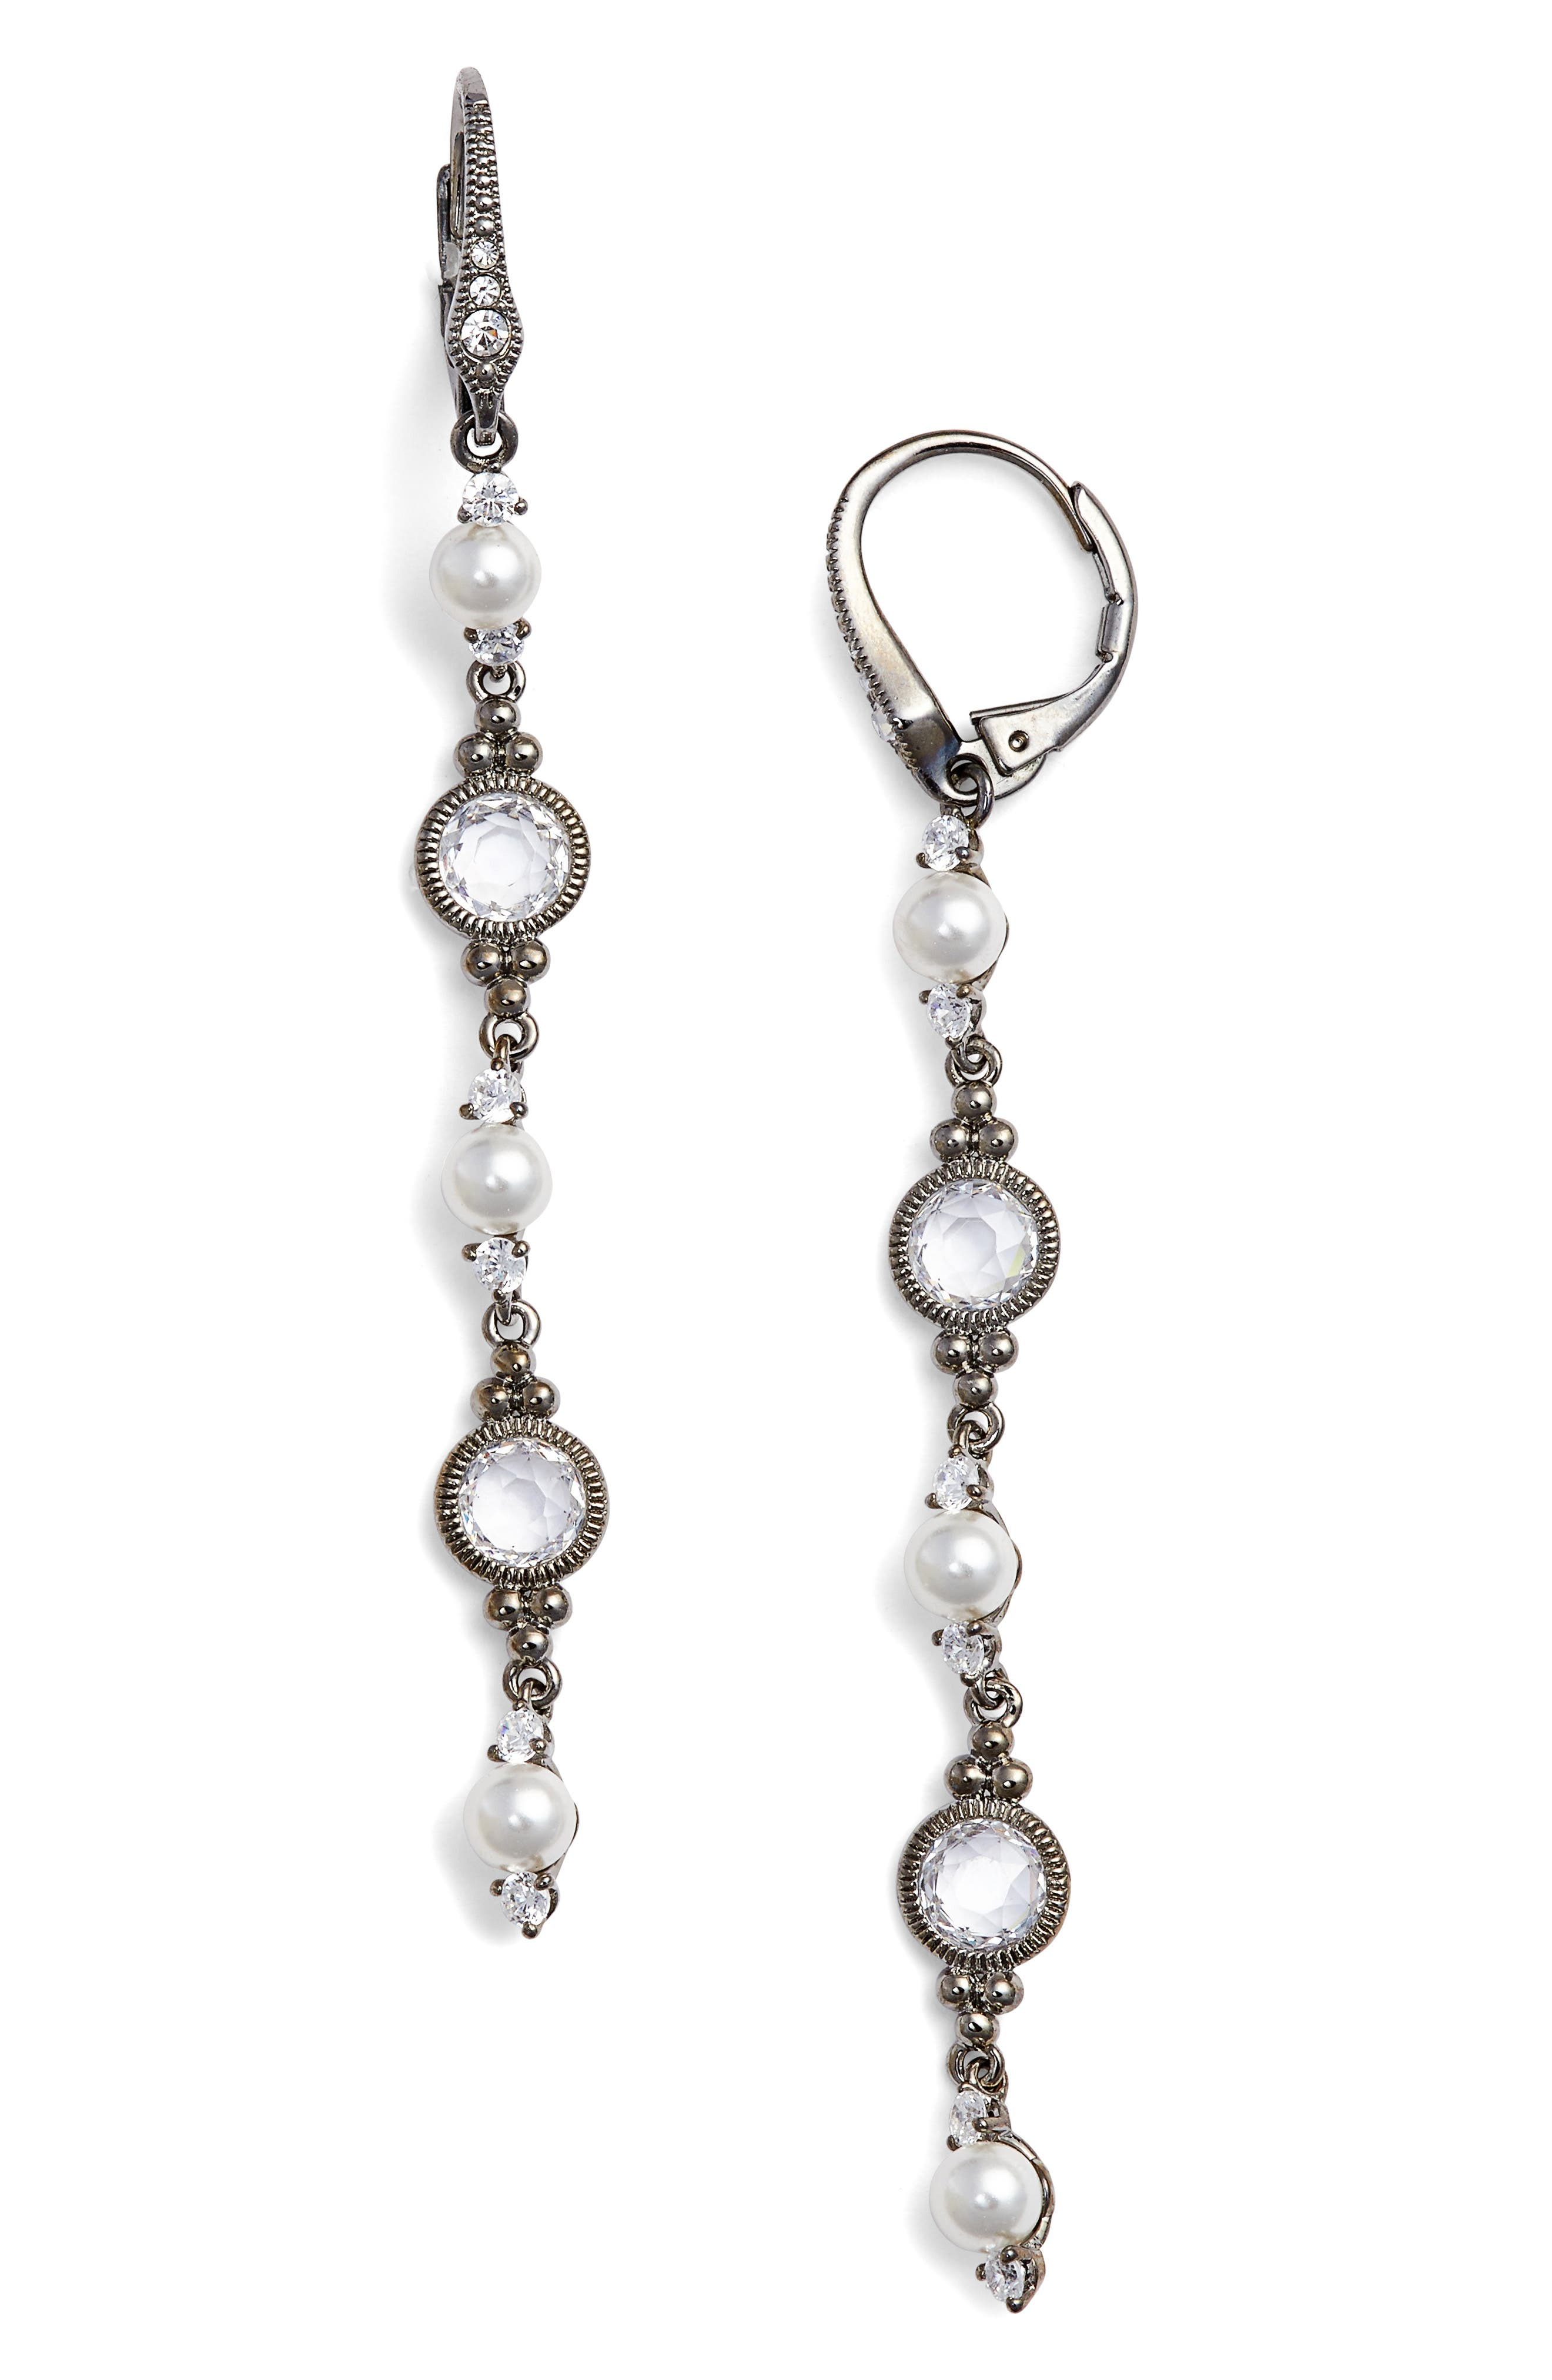 Main Image - Nadri Cubic Zirconia & Imitation Pearl Linear Drop Earrings